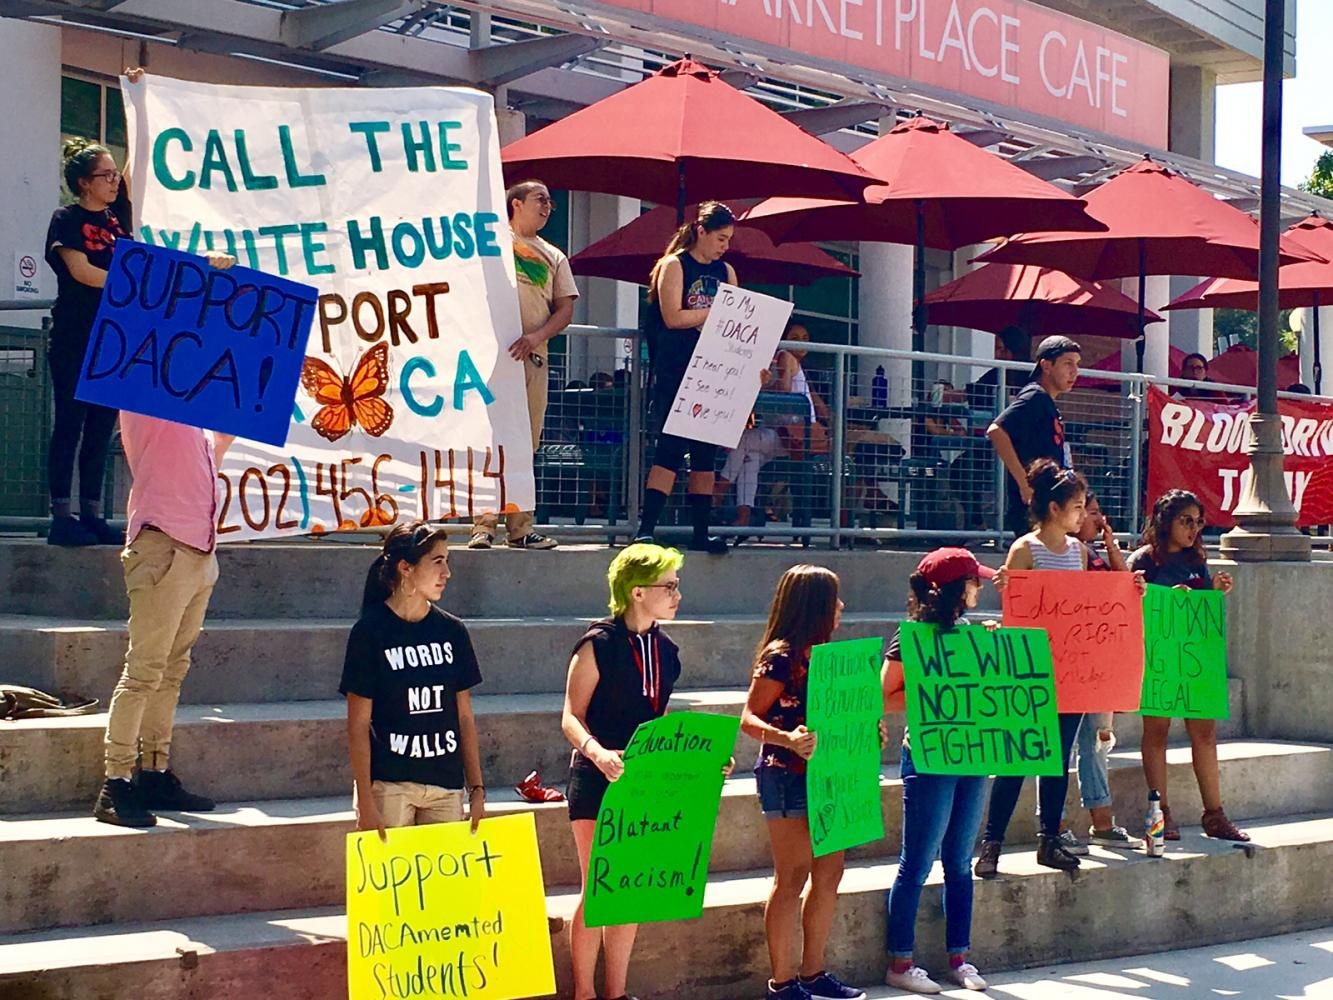 Chico students protest the DACA decision. Photo credit: Luke Dennison